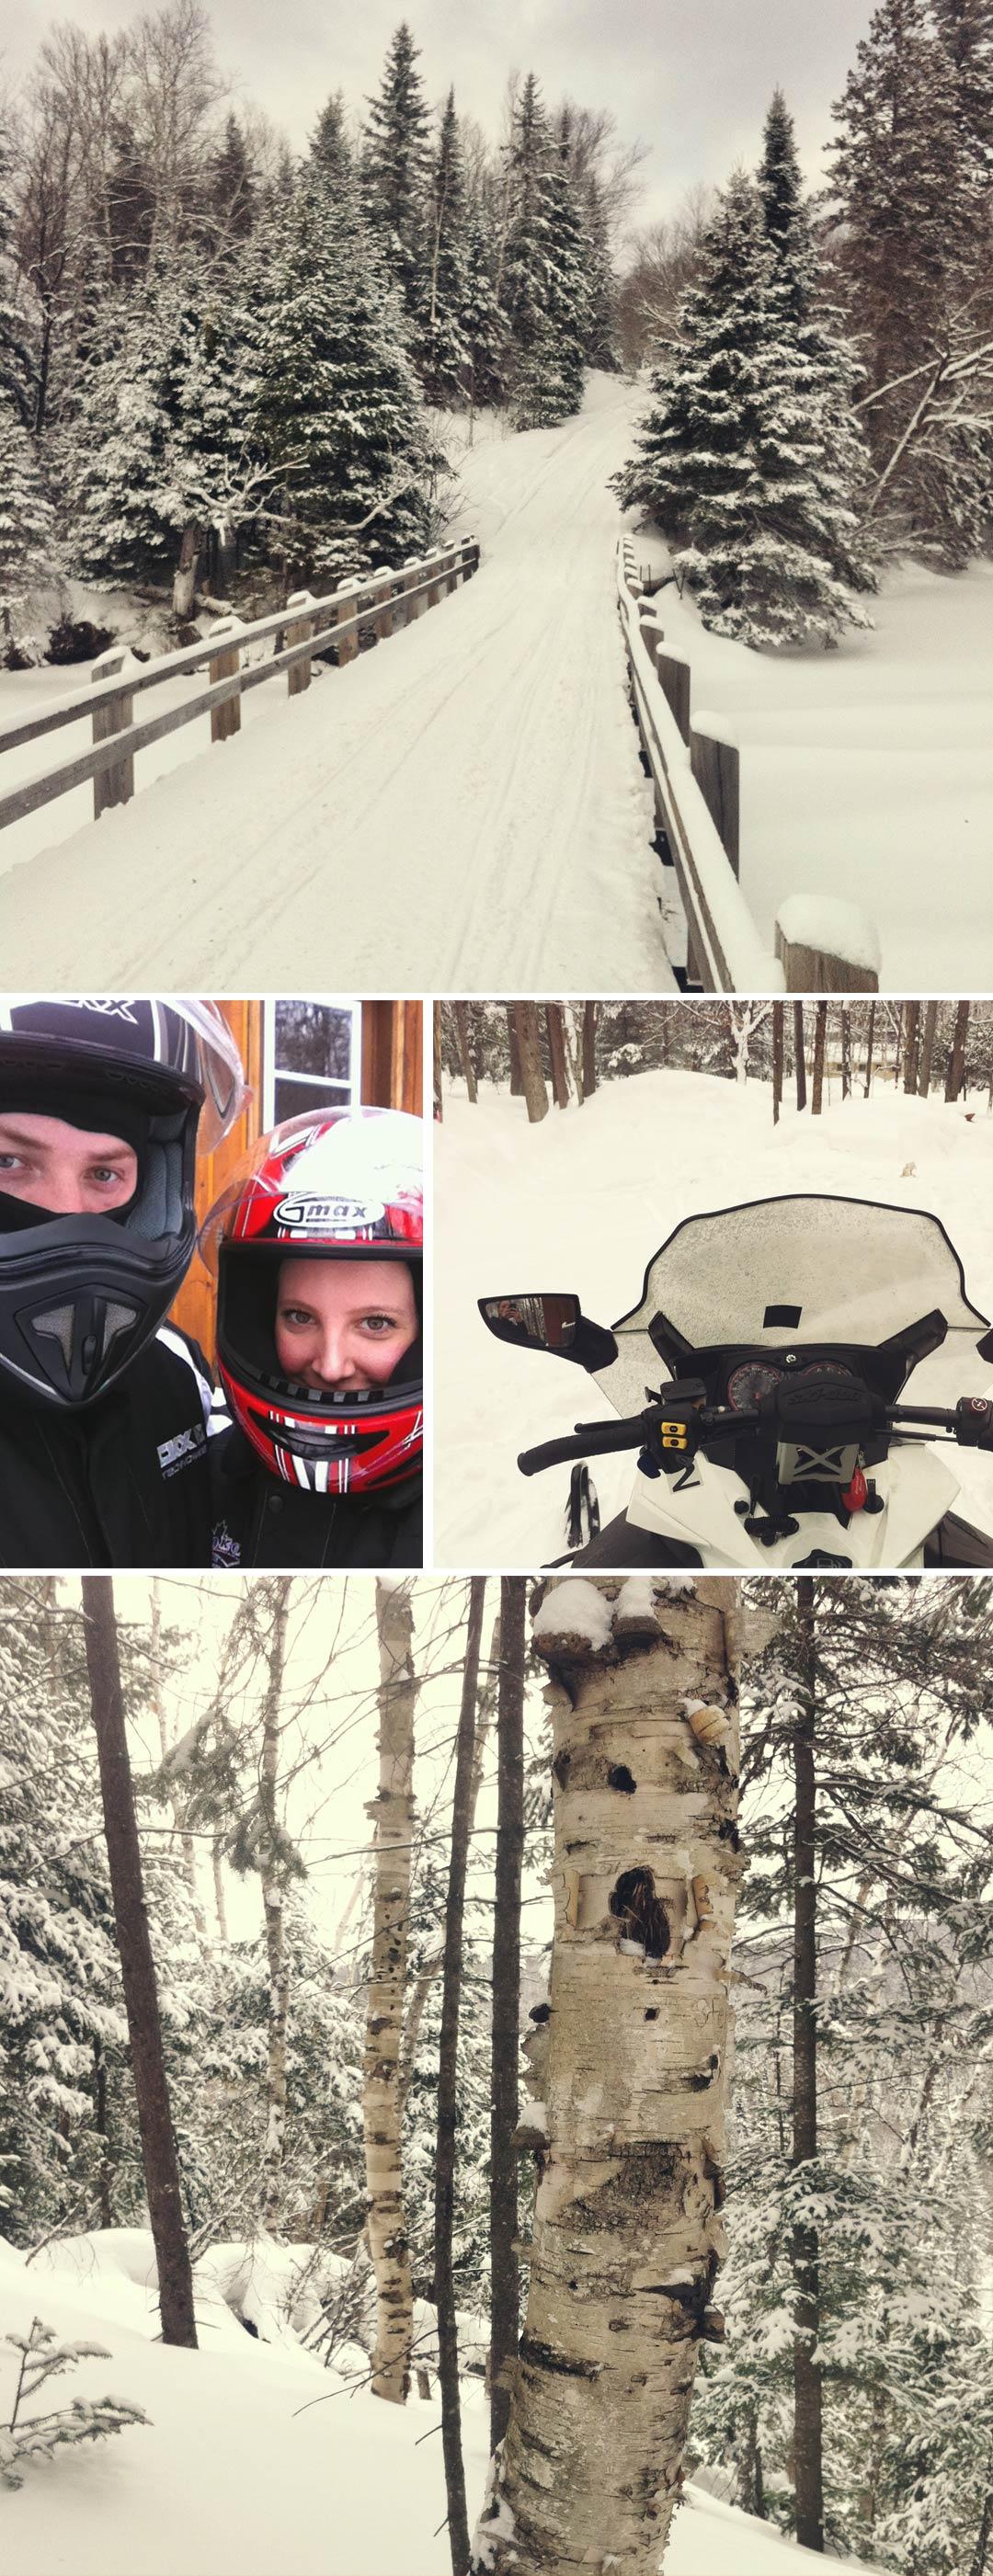 Muskoka: A Wintery Weekend Getaway